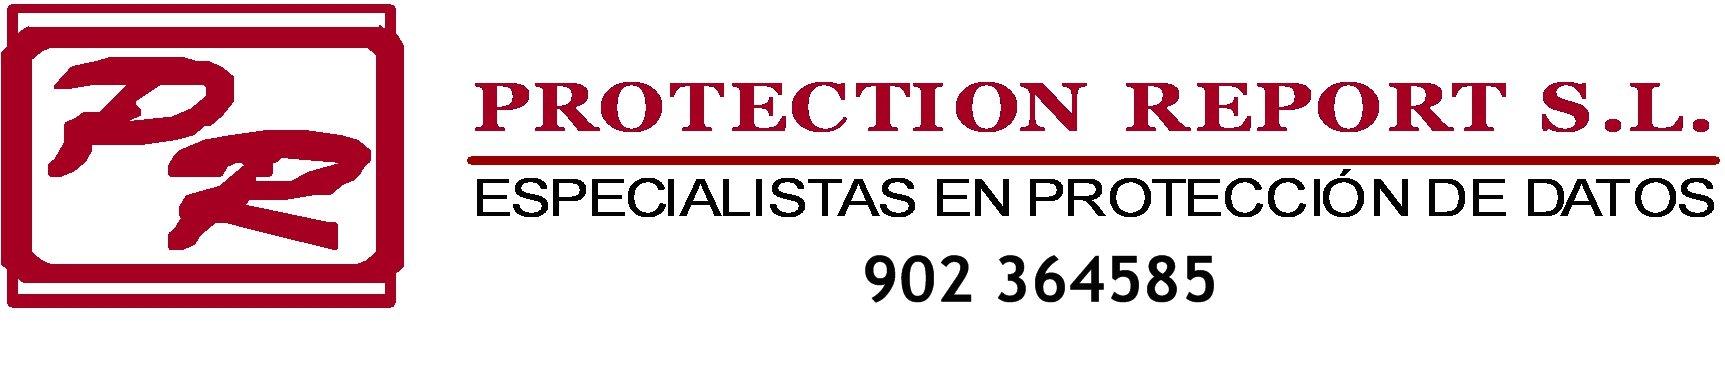 LOGO_PROTECTION